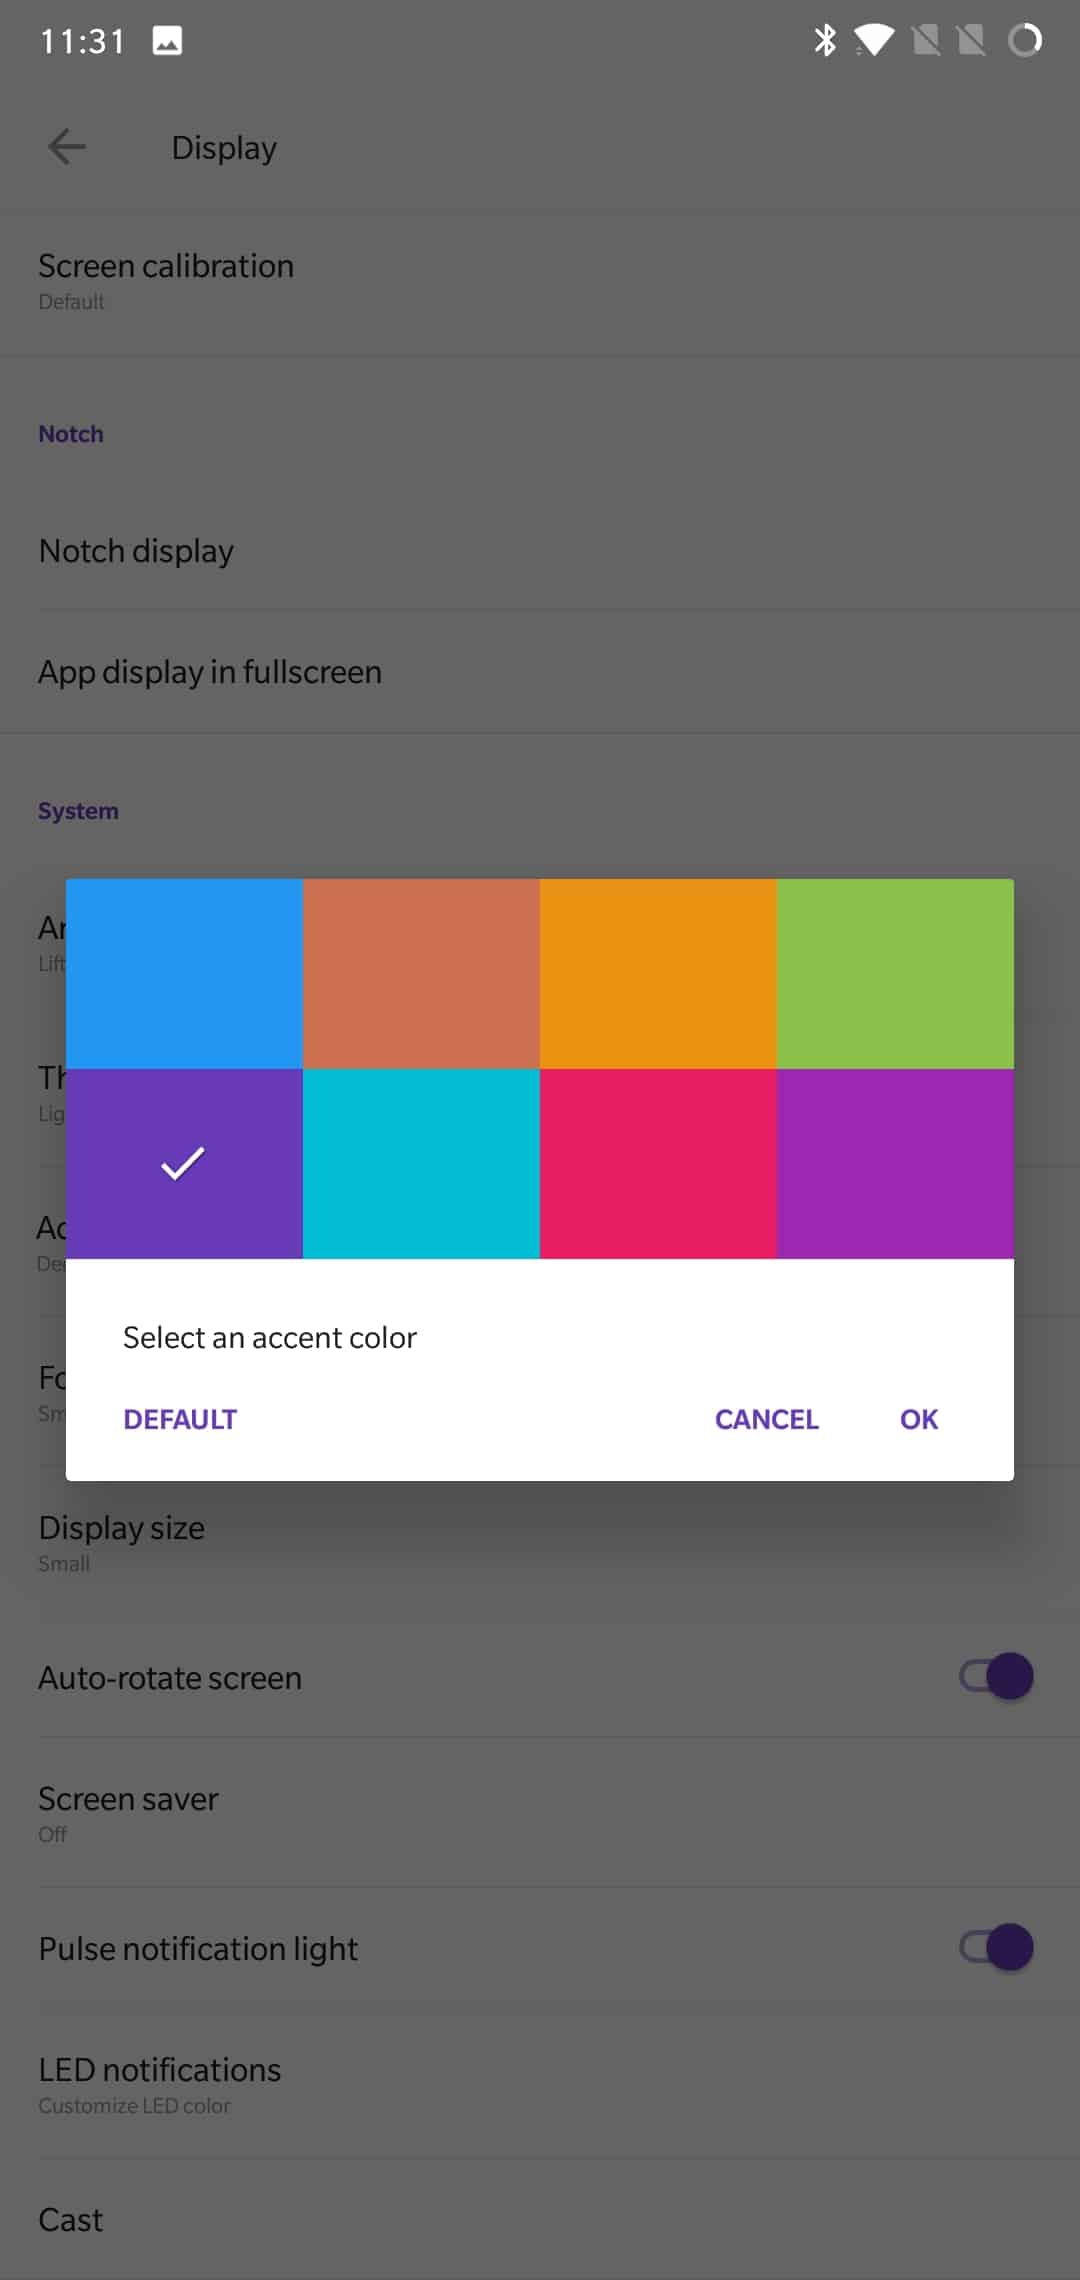 OnePlus 6 AH NS Screenshots display 5 themes